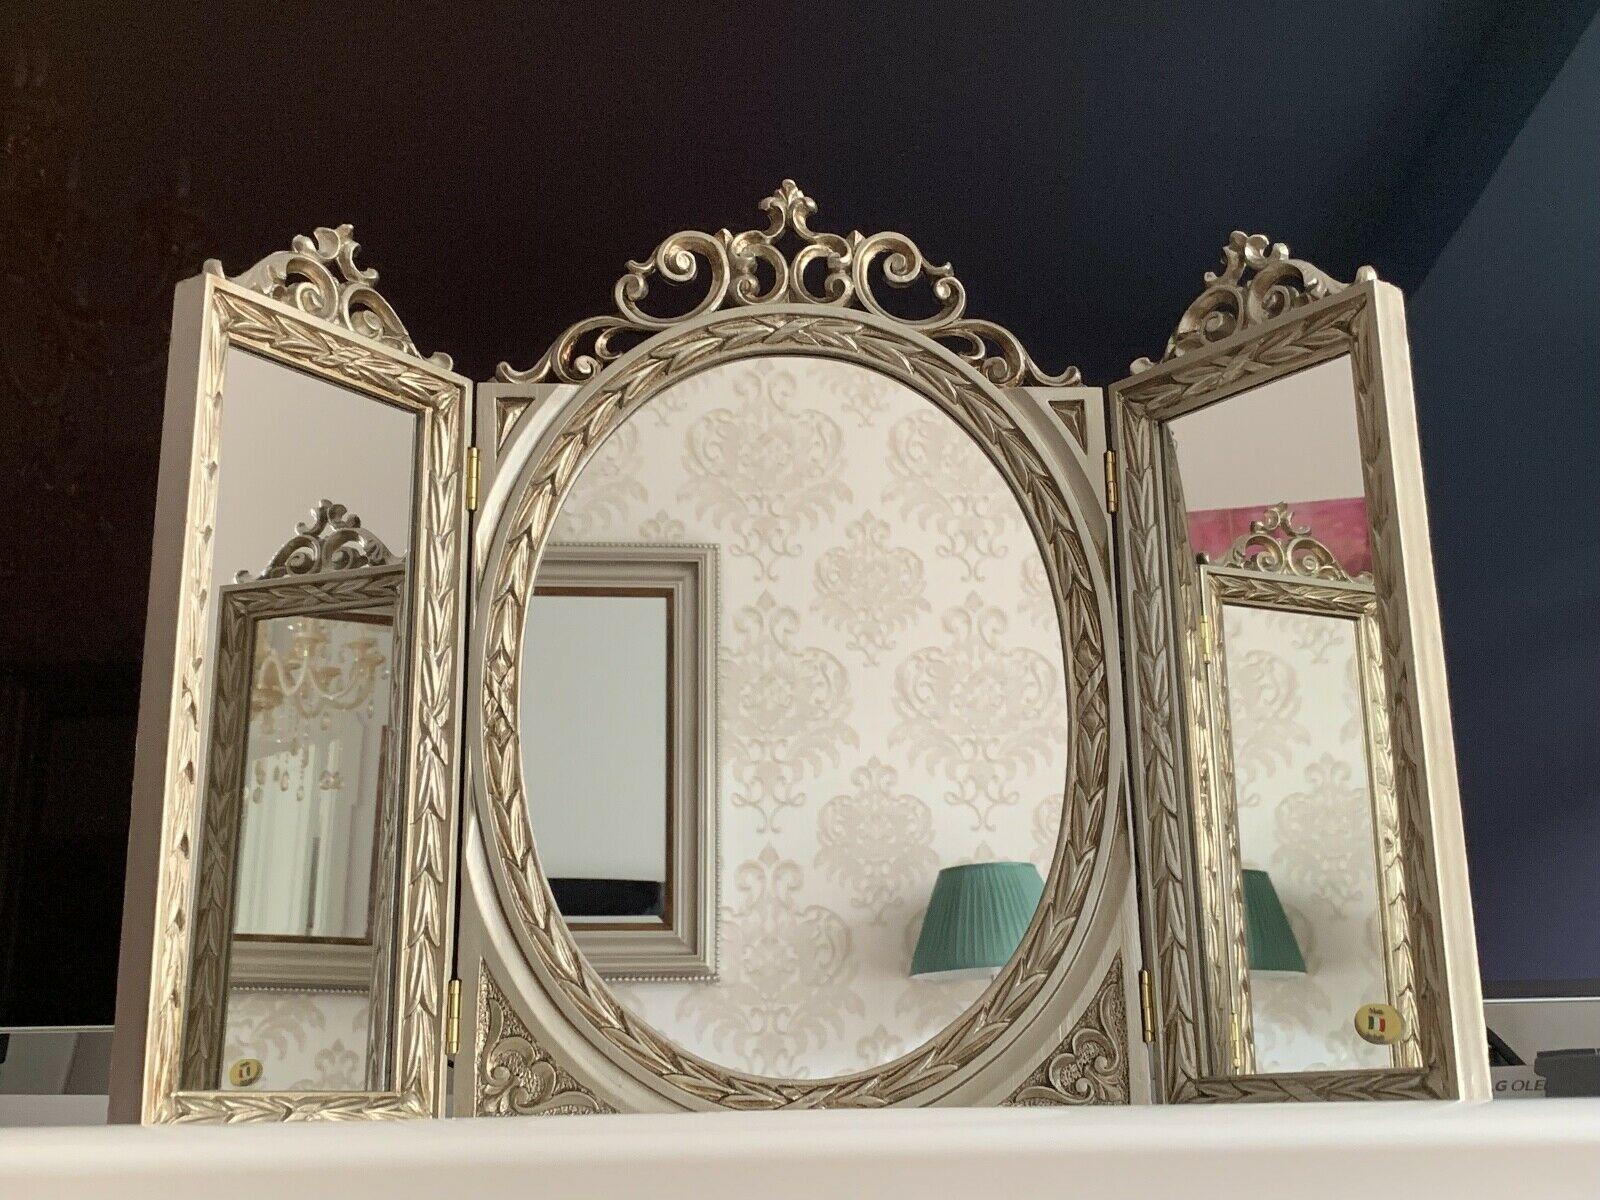 Badezimmerspiegel Rechteckig.Wandspiegel Antik Silber Oval Rechteckig Badspiegel Barock 60x46